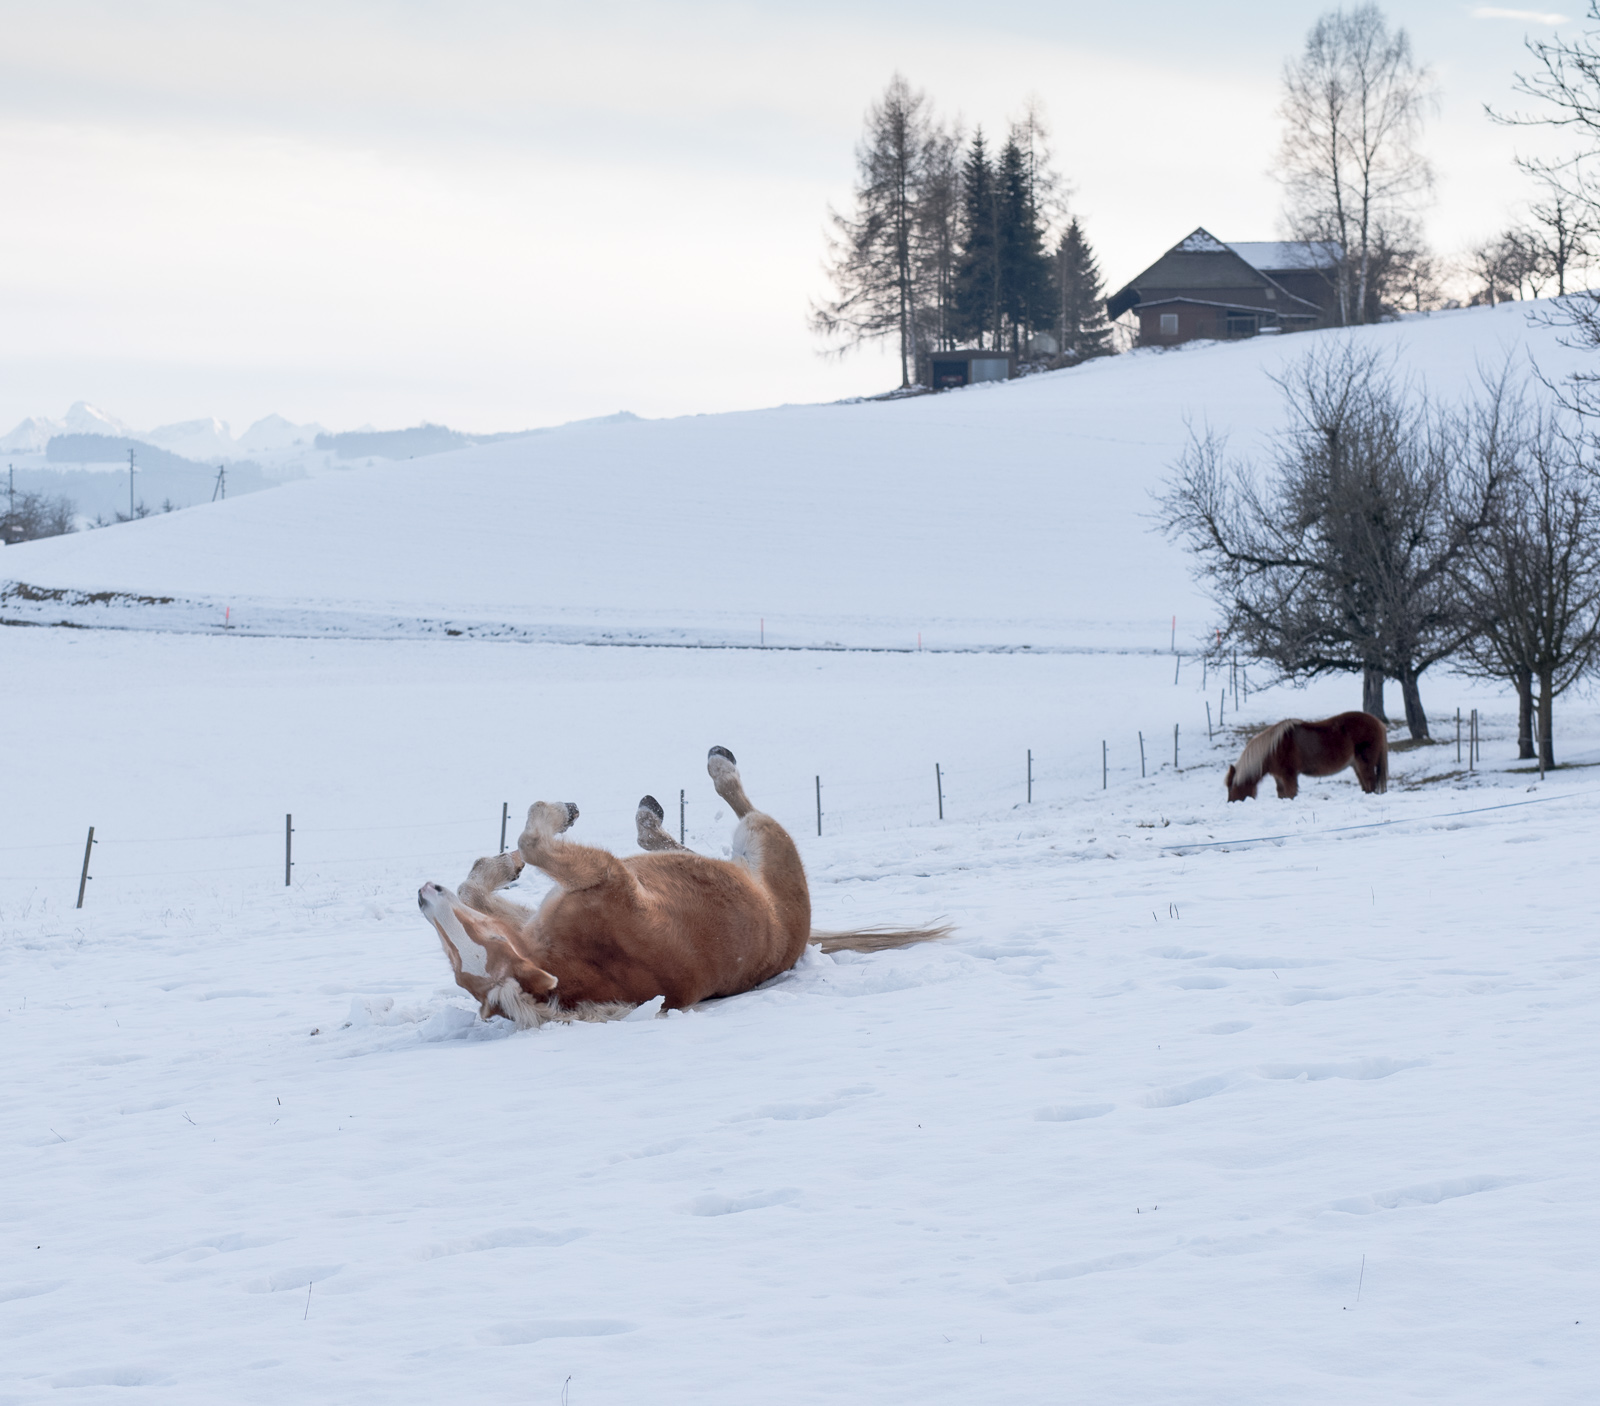 Ah, Schnee!